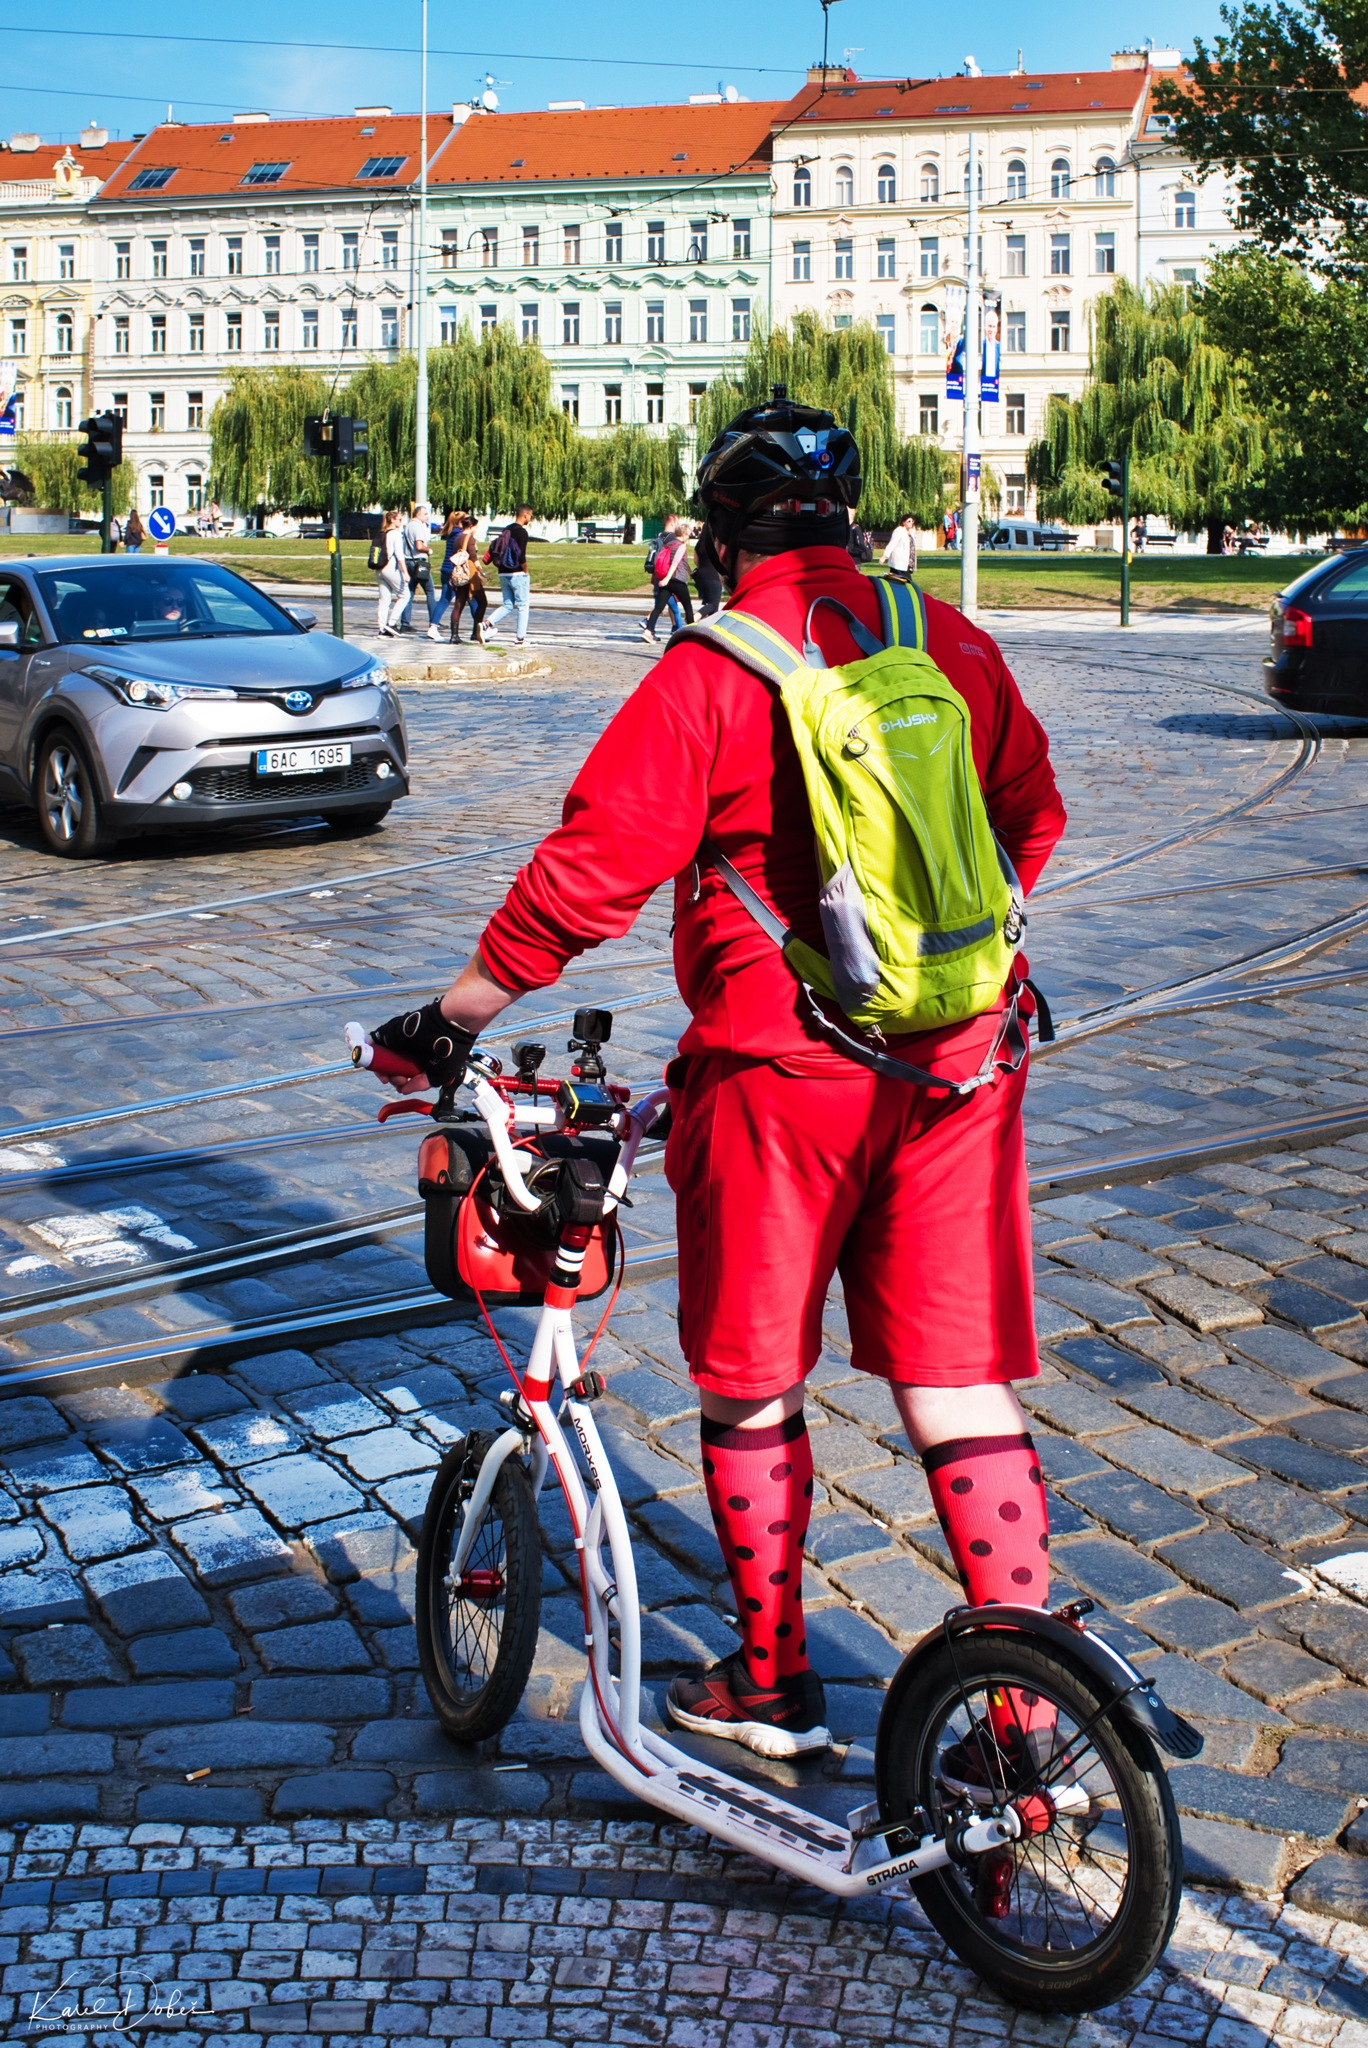 safely across Prague on a scooter by Karel Dobes